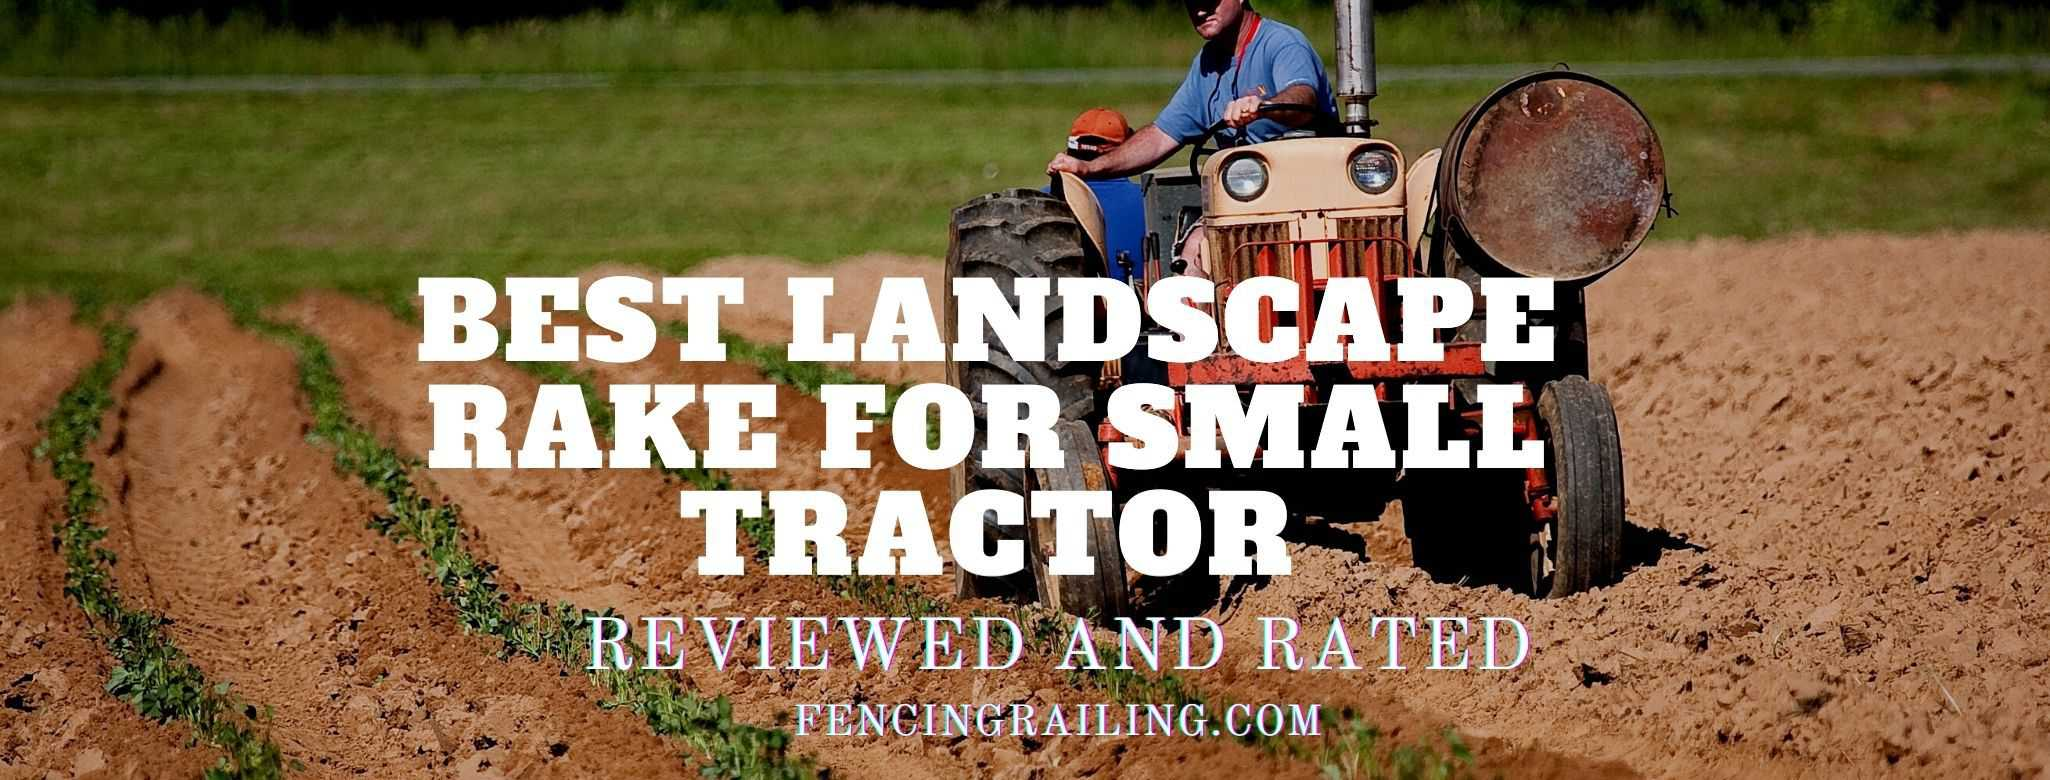 best landscape rake for tractors